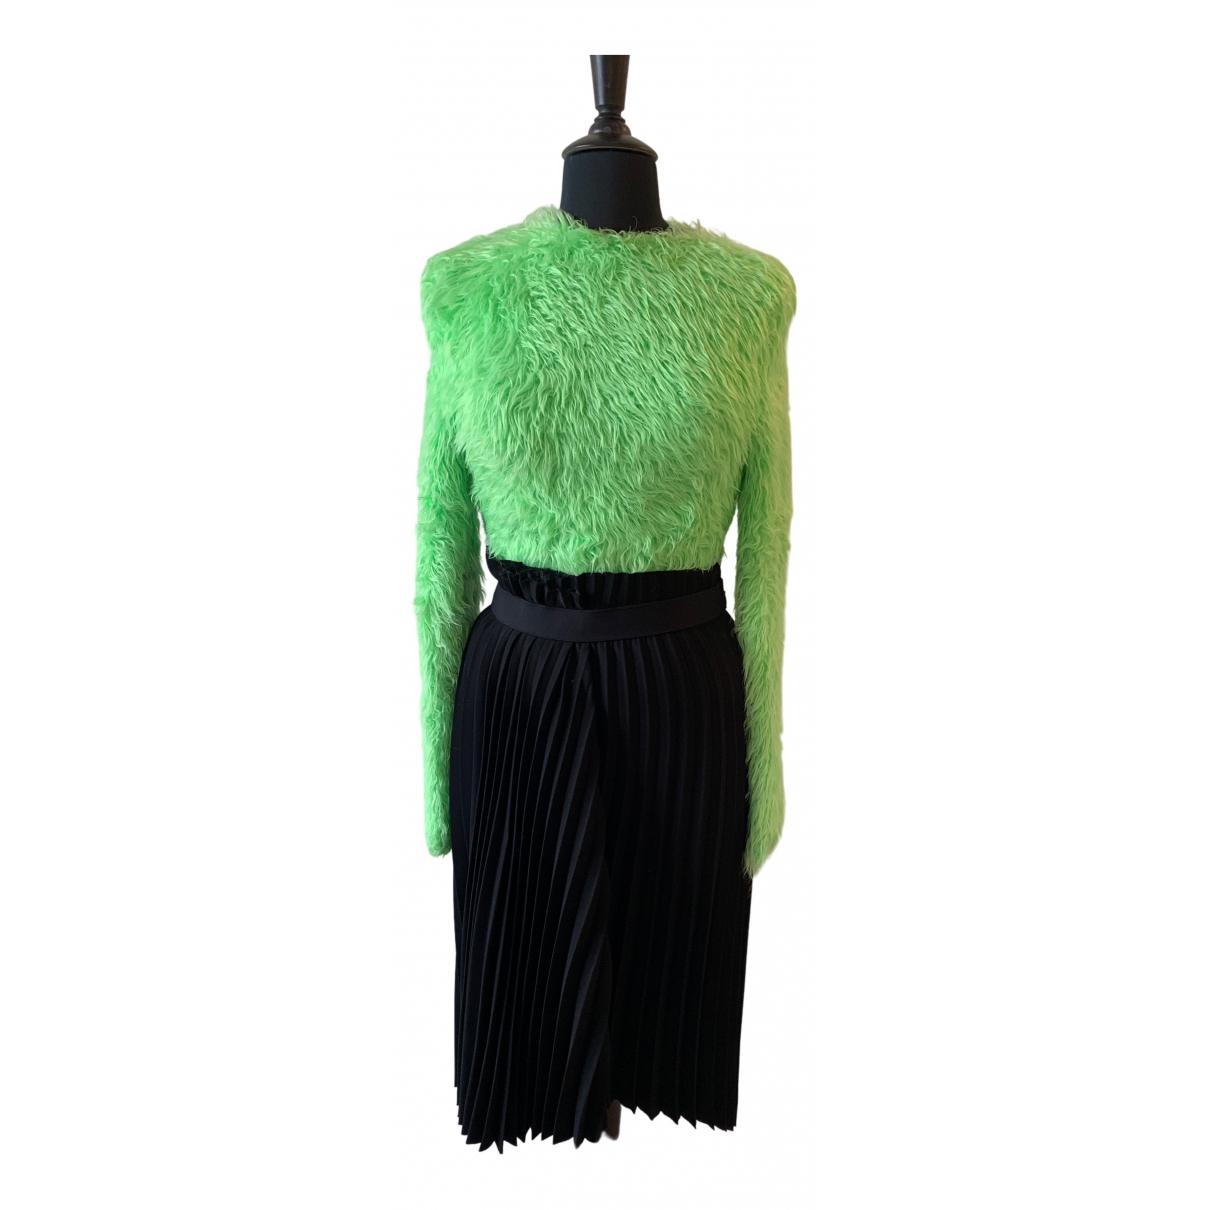 Balenciaga \N Green Knitwear for Women S International